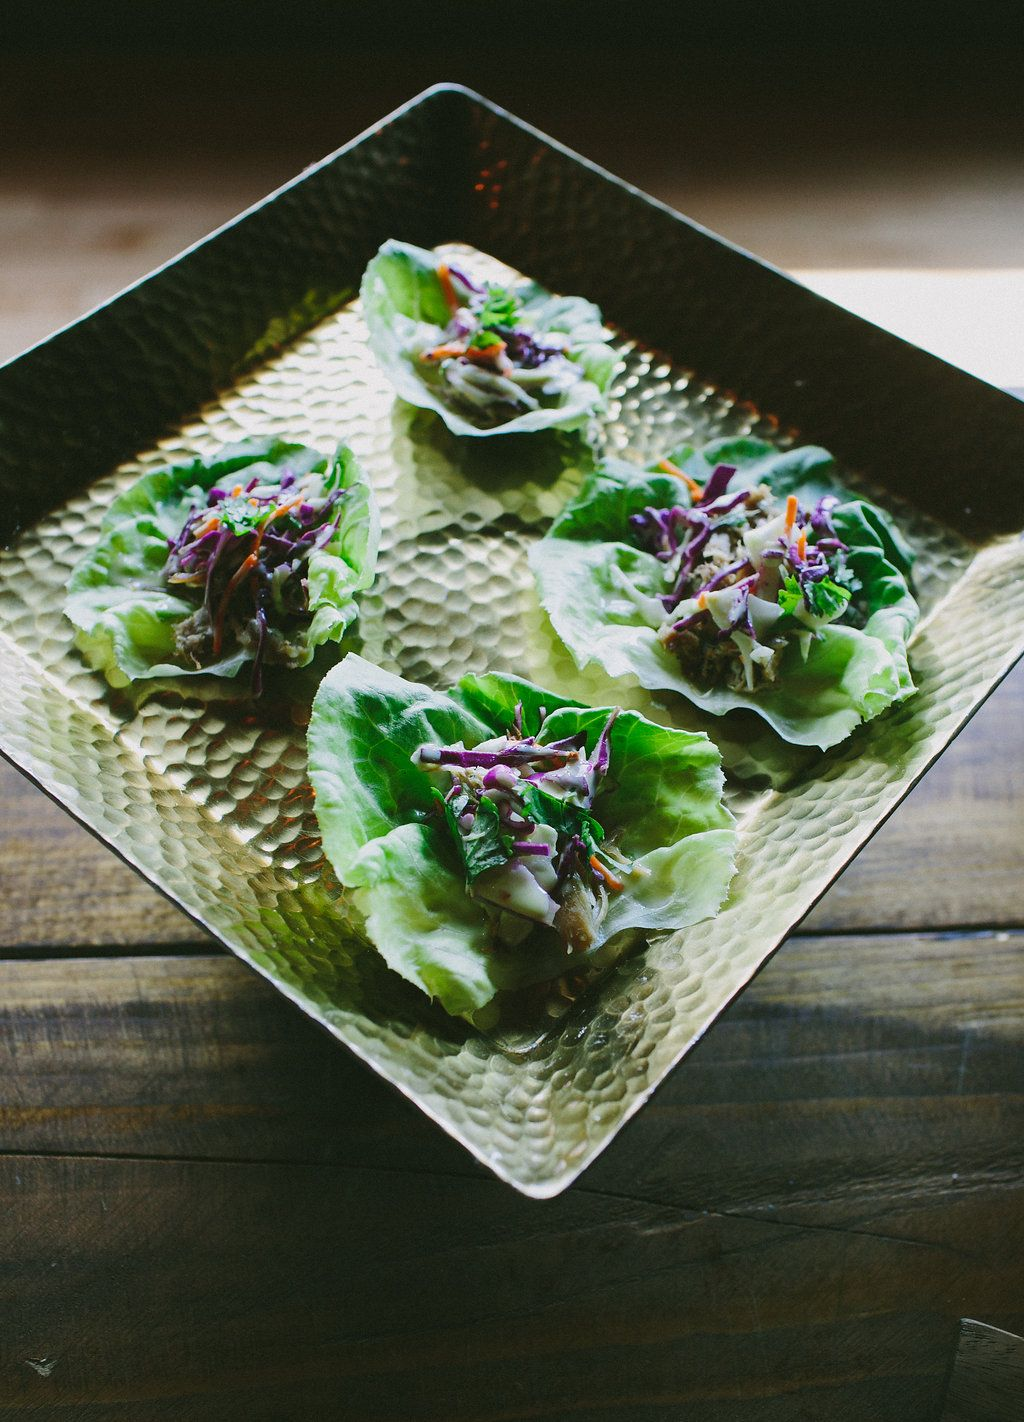 Summer Open House Photo by Amber Vickery Photography #BrodieHomestead #weddingvenue #austin #food #lettucewraps #thepeachedtortilla